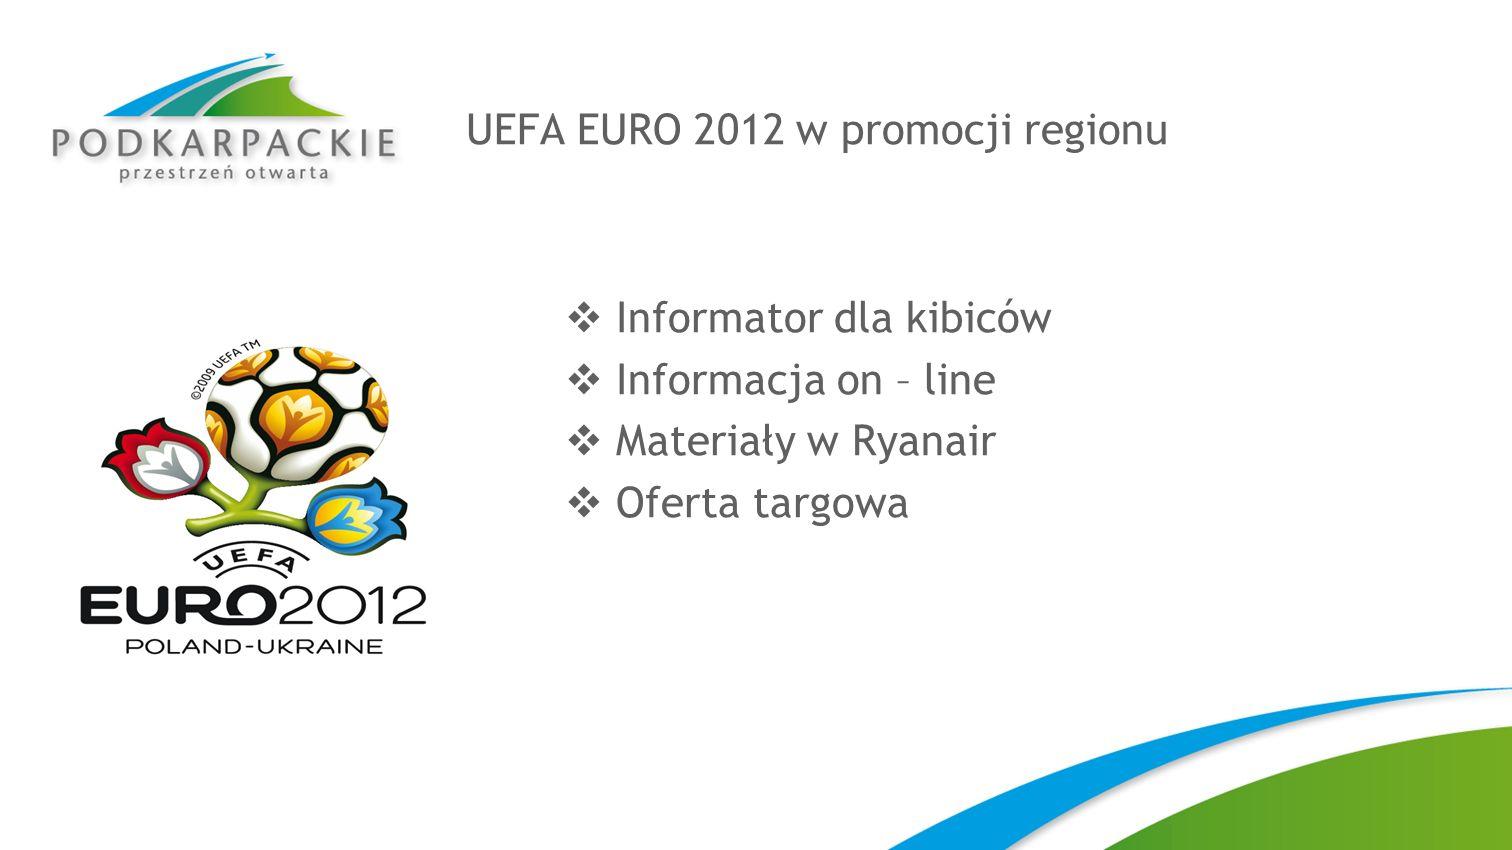 UEFA EURO 2012 w promocji regionu